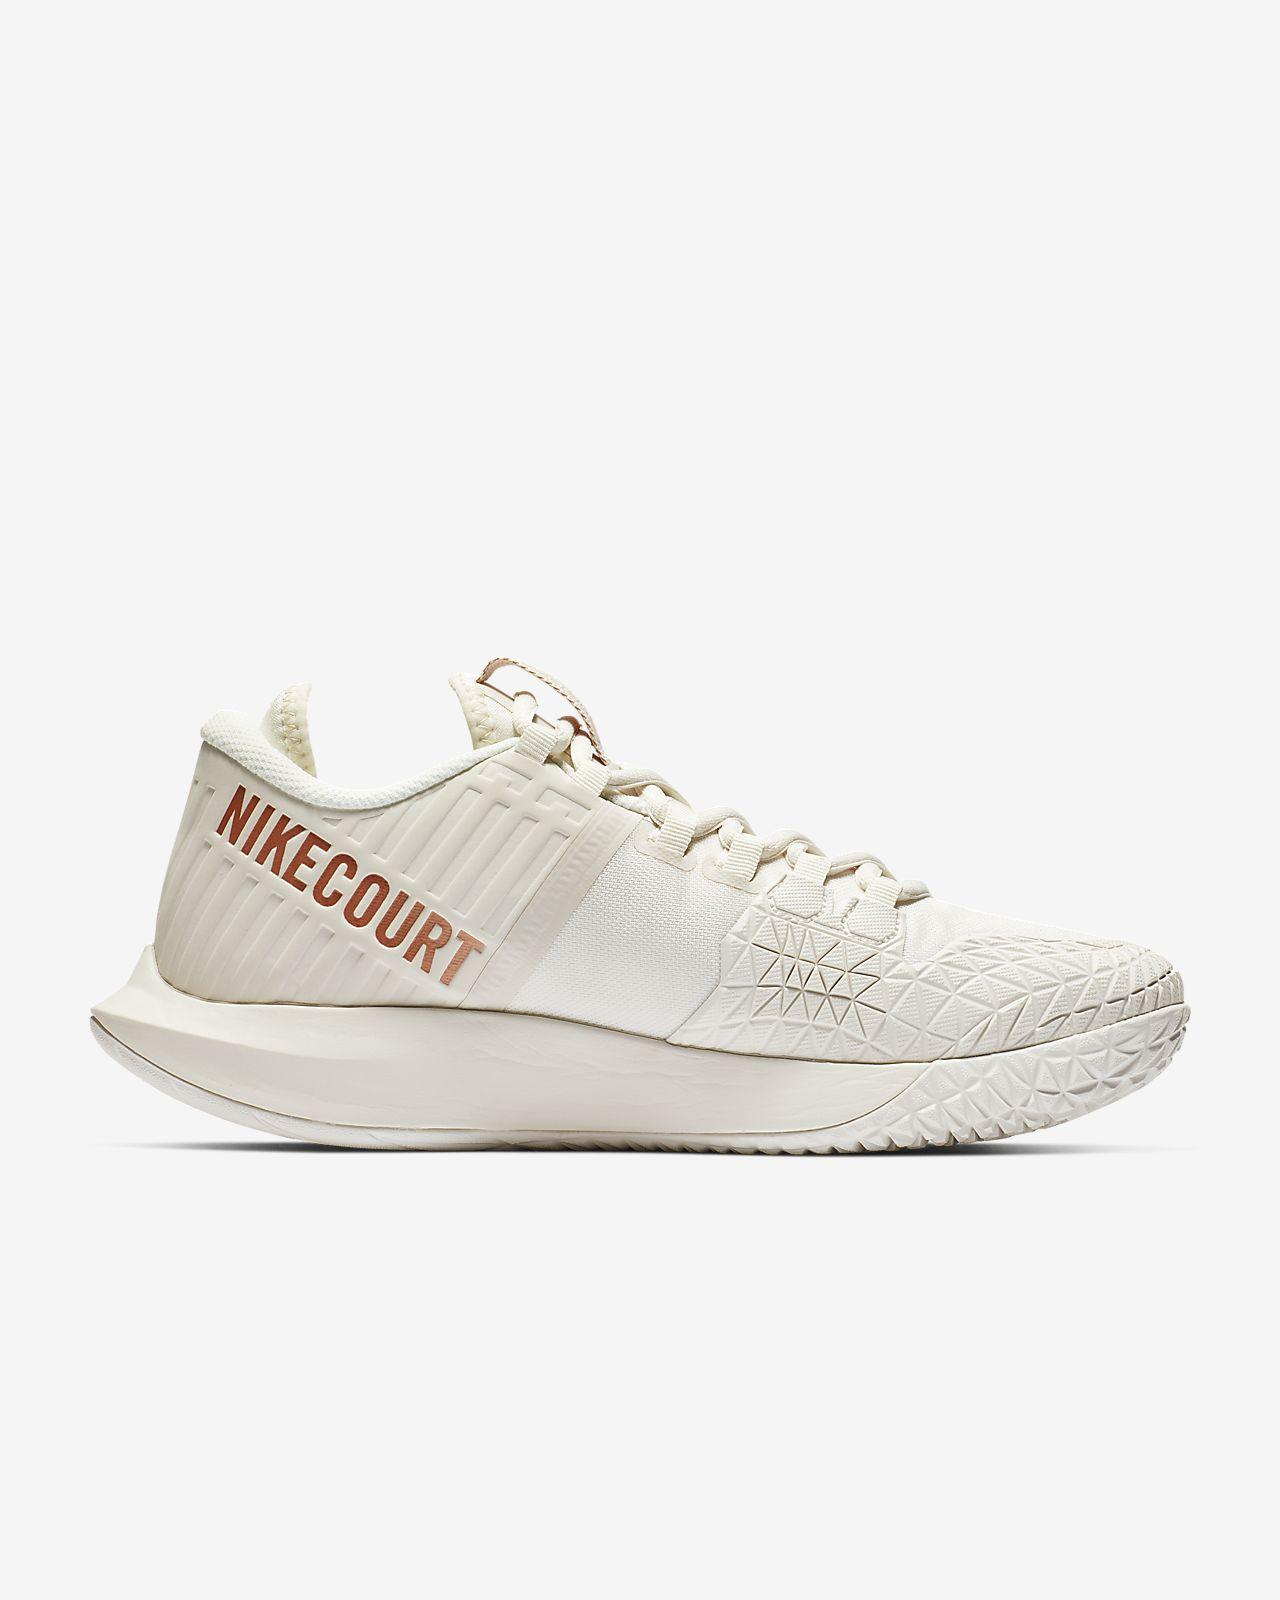 best loved 8cd1b 670d2 Chaussure de tennis NikeCourt Air Zoom Zero pour Femme. Nike.com CA